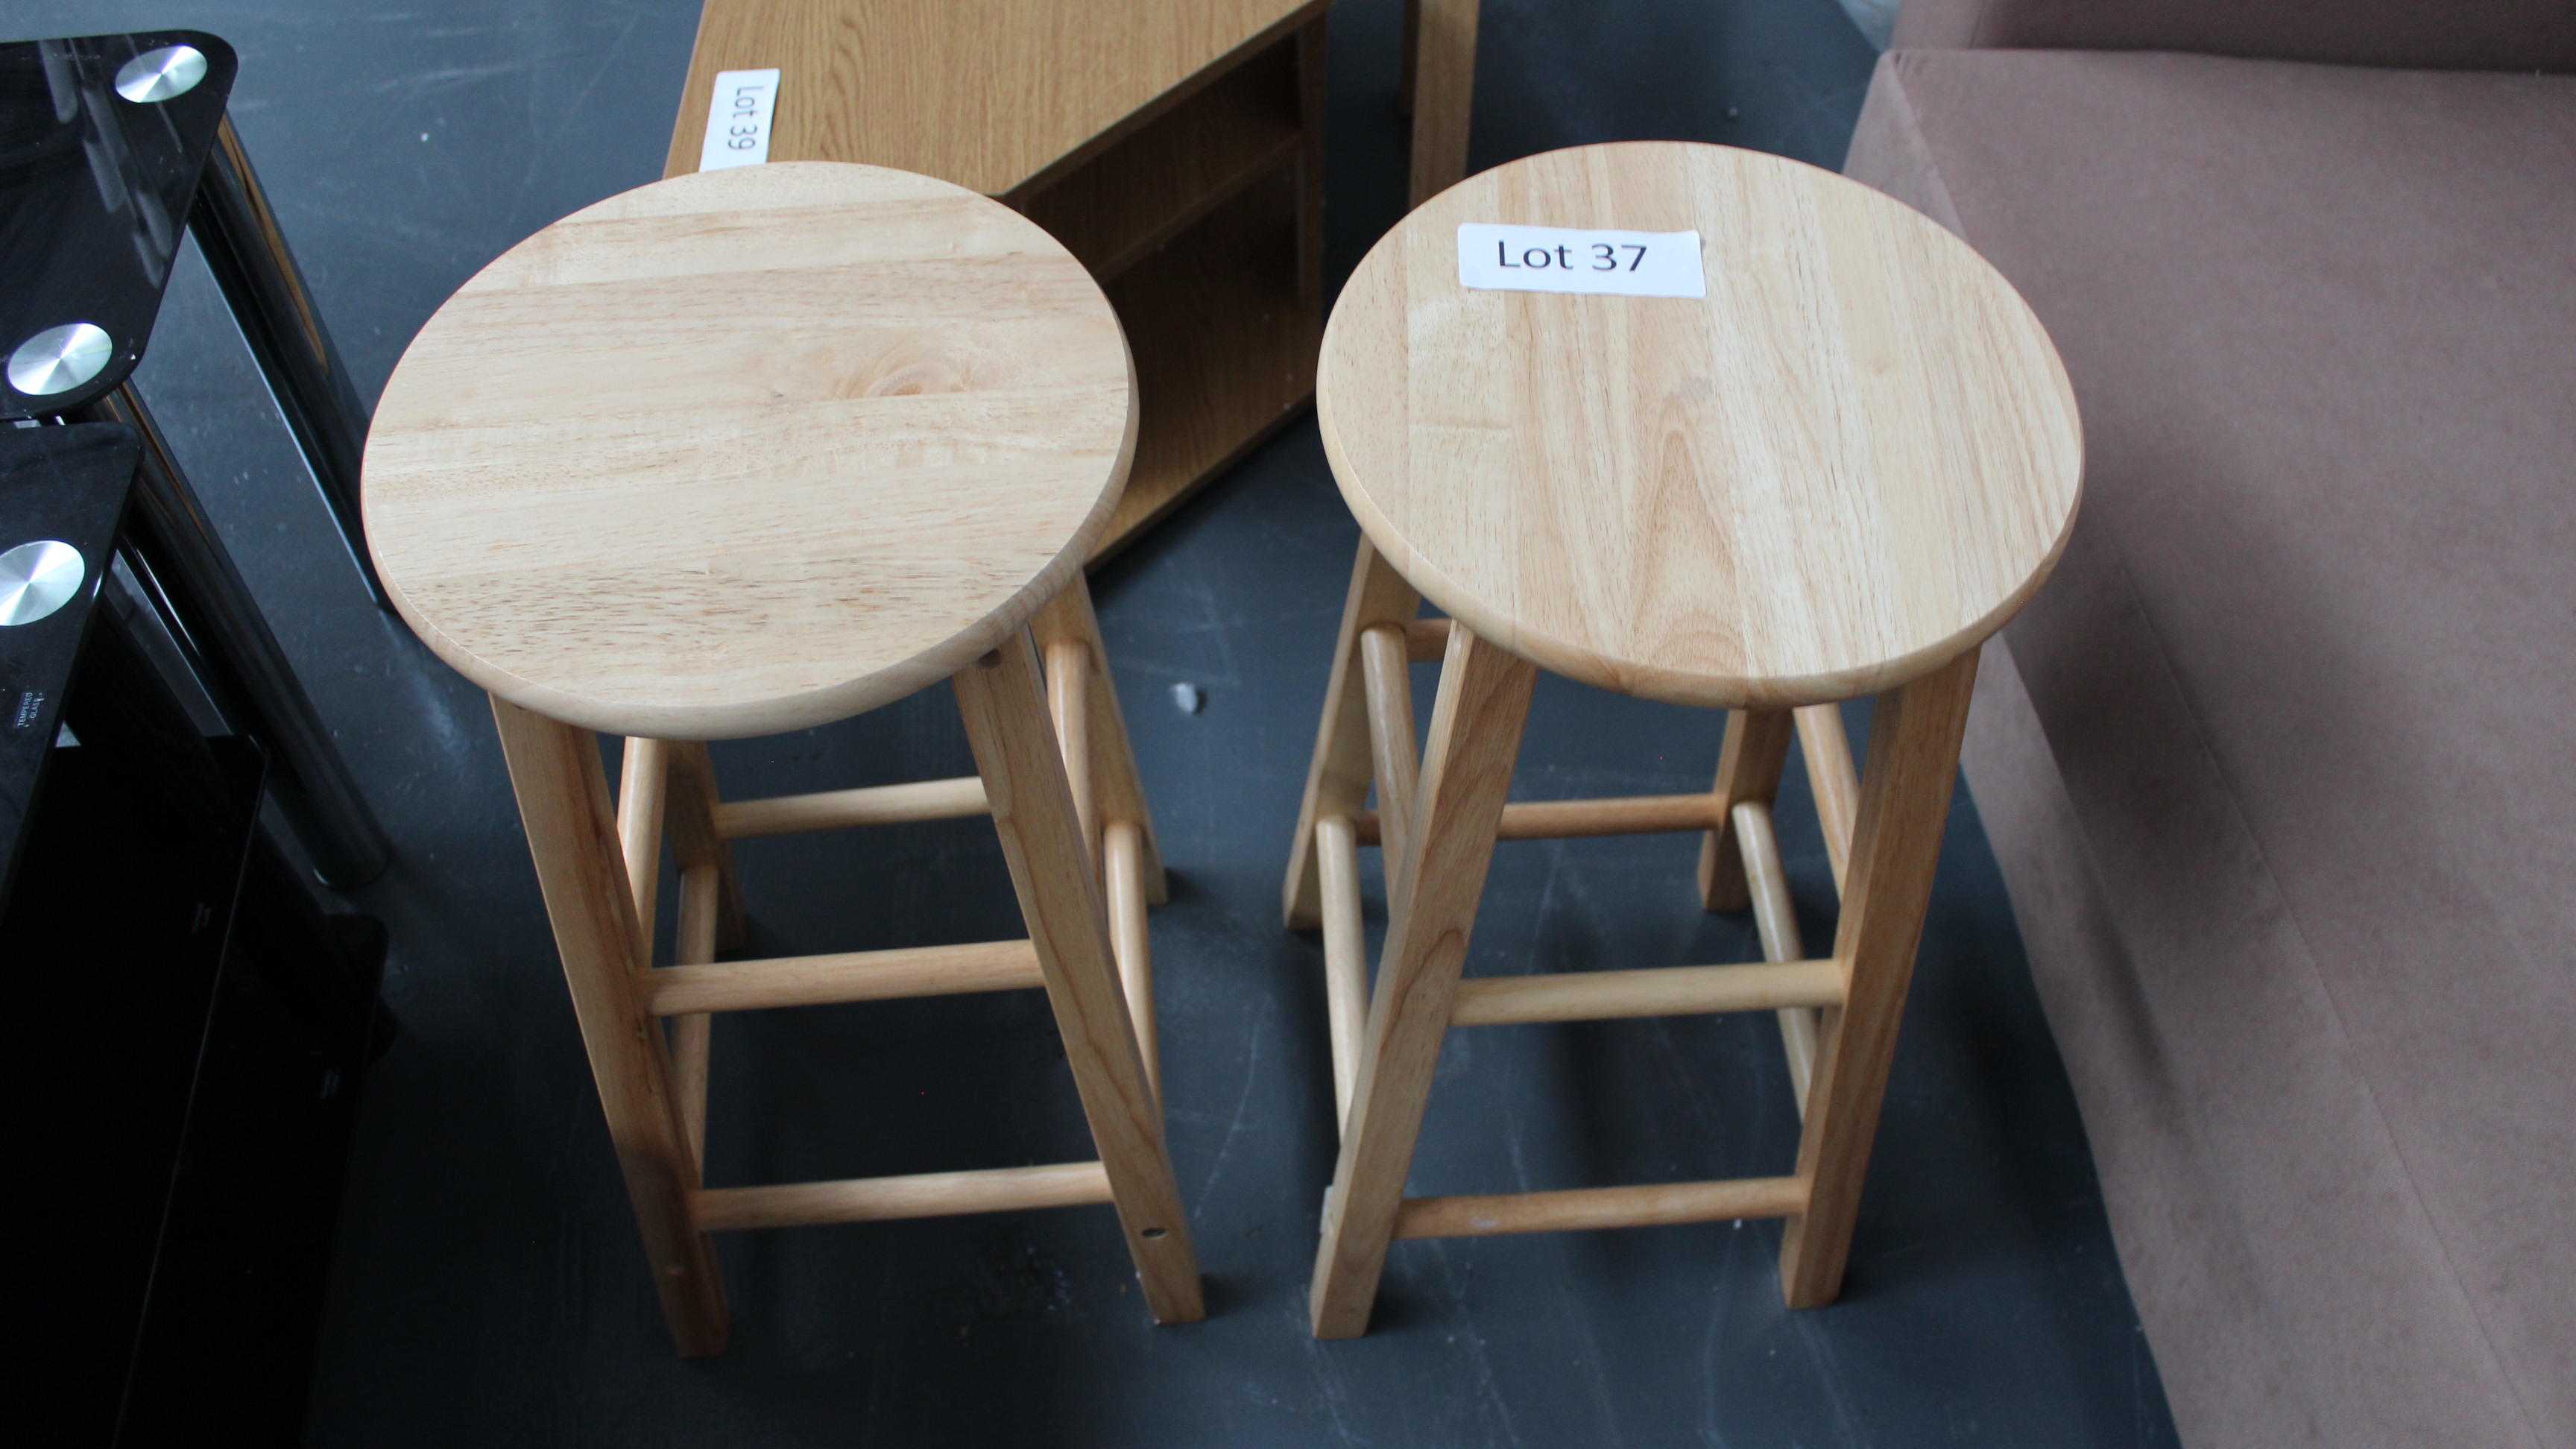 Lot 37 - 2 Mini Wooden Bar Stools. Customer Returns